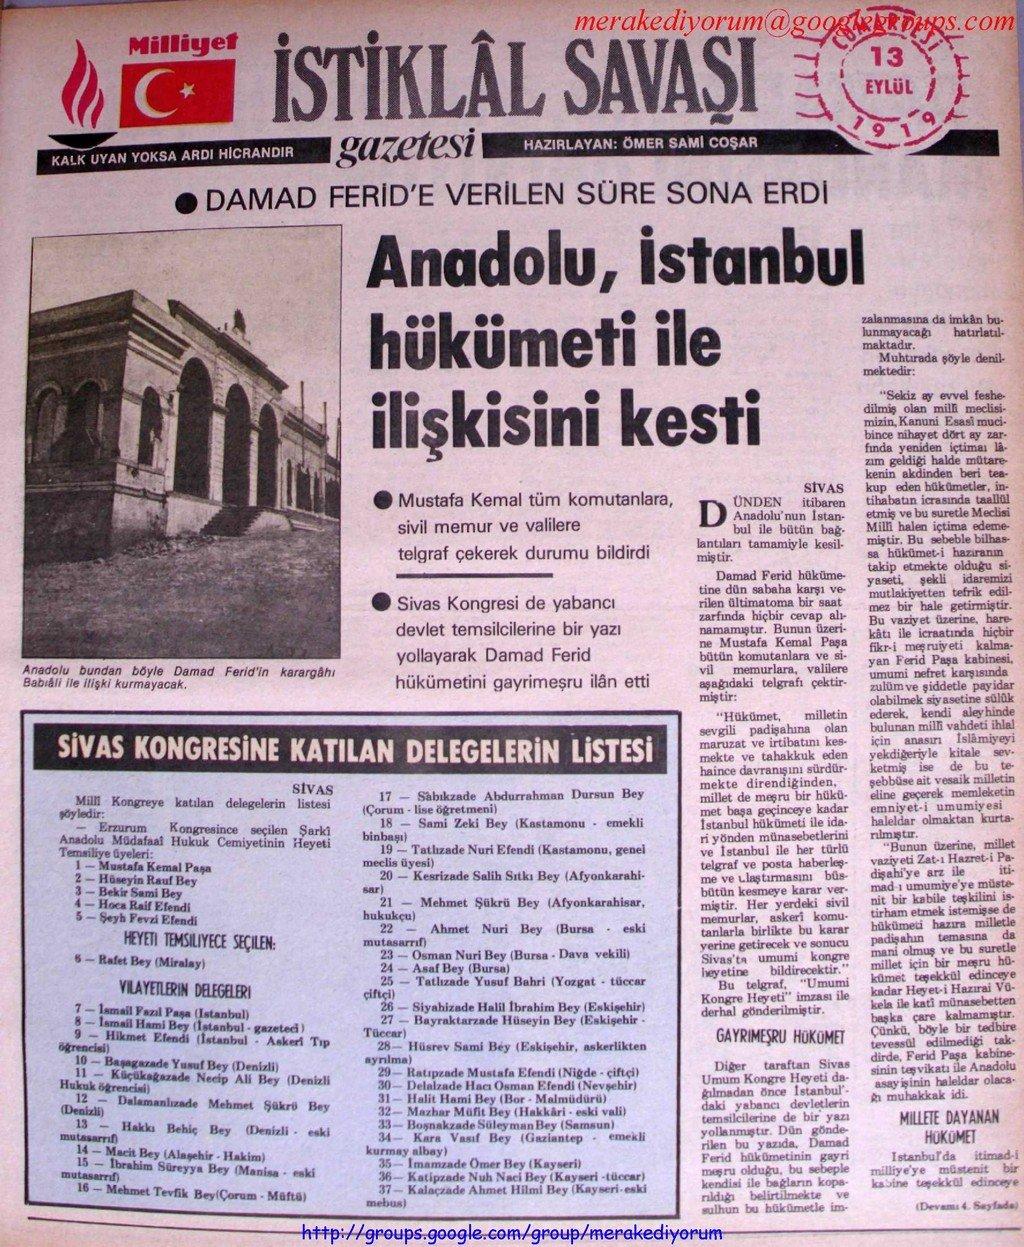 istiklal savaşı gazetesi - 13 eylül 1919